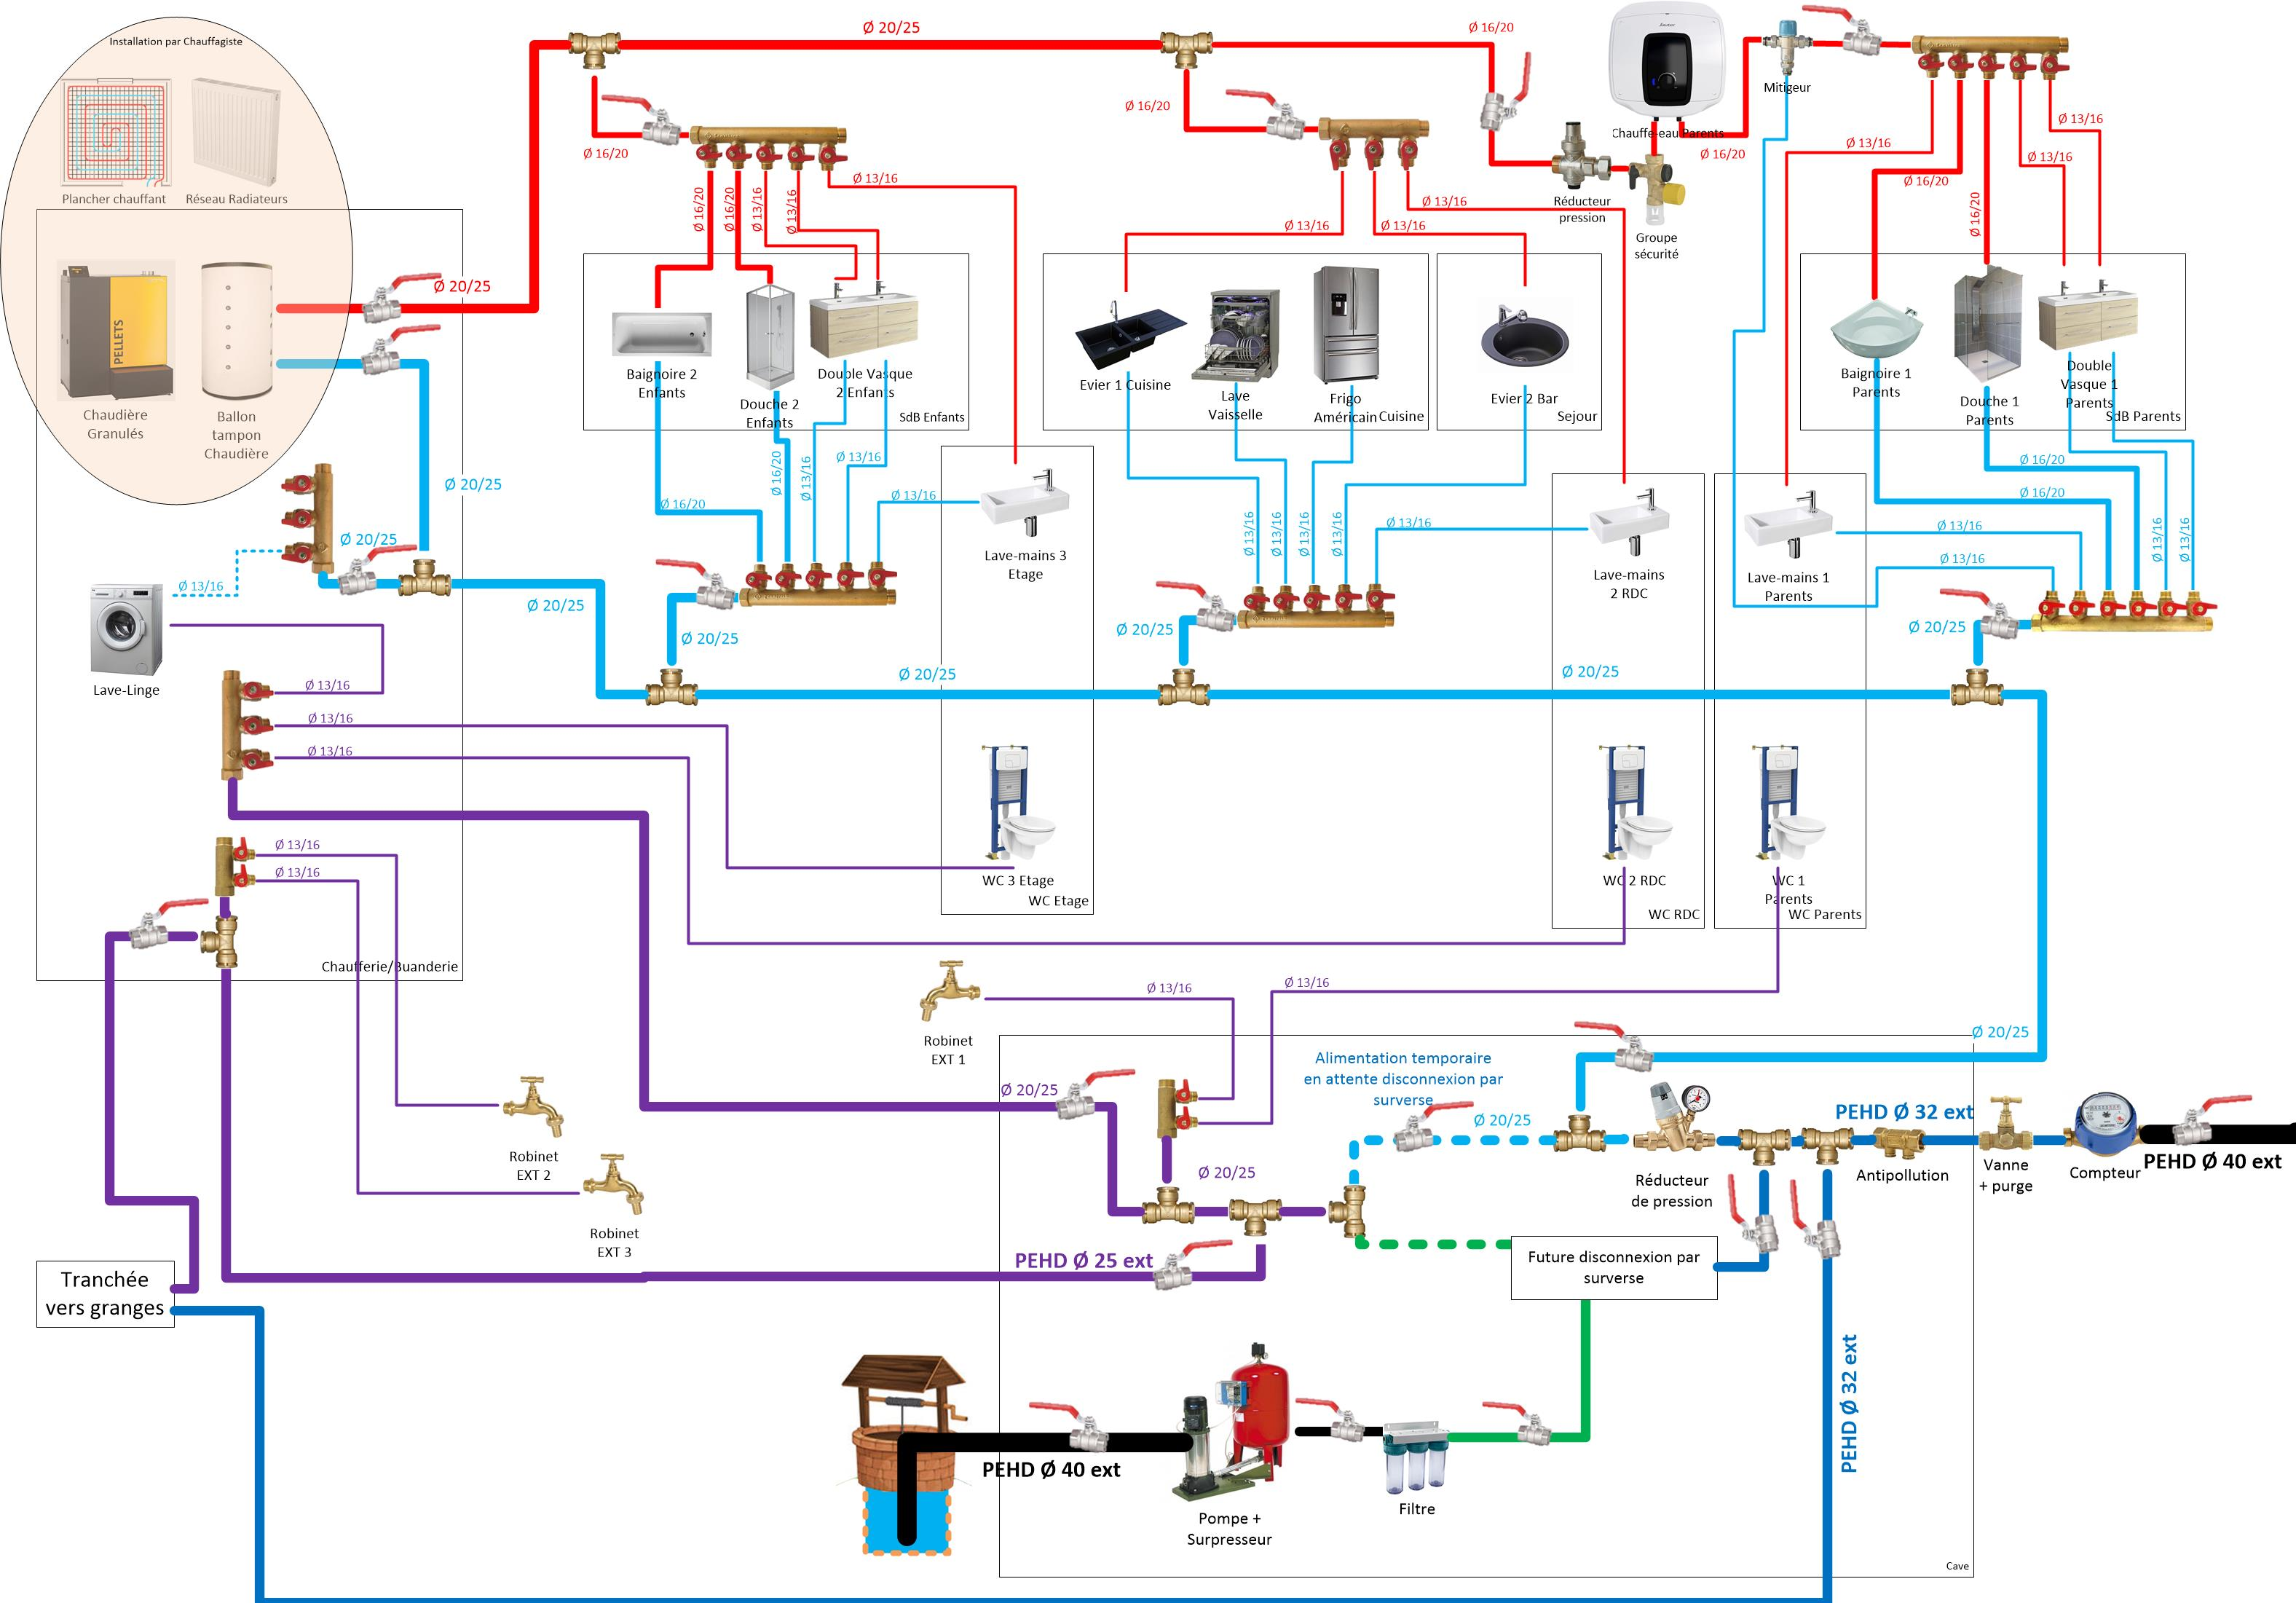 Schema plomberie Cedric2.JPG, 538.14 kb, 3153 x 2201